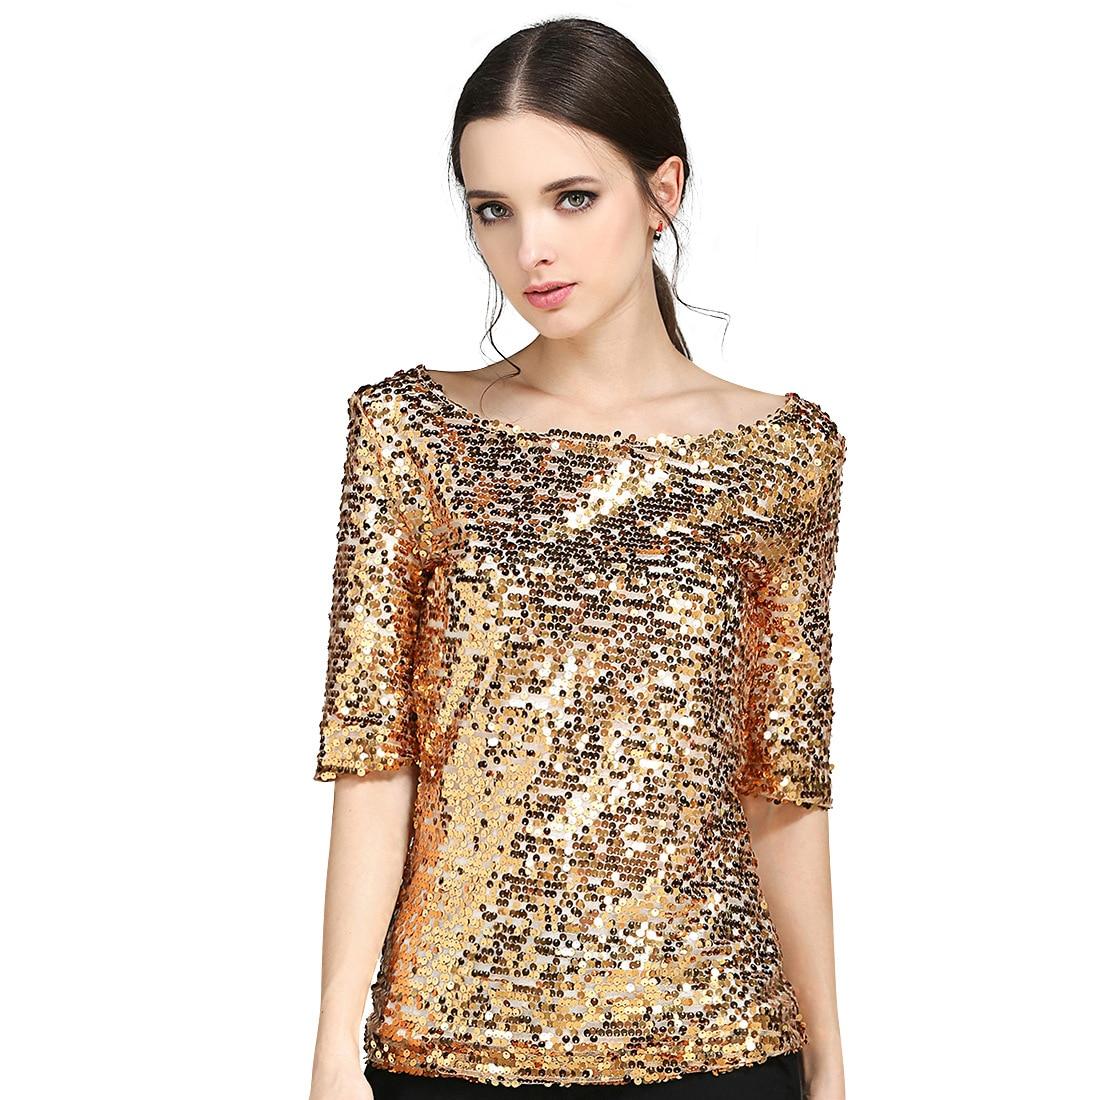 women   blouse     shirt   casual O neck half sleeve Gold black silver Sequin Korean fashion summer autumn tops female clothing S-5XL